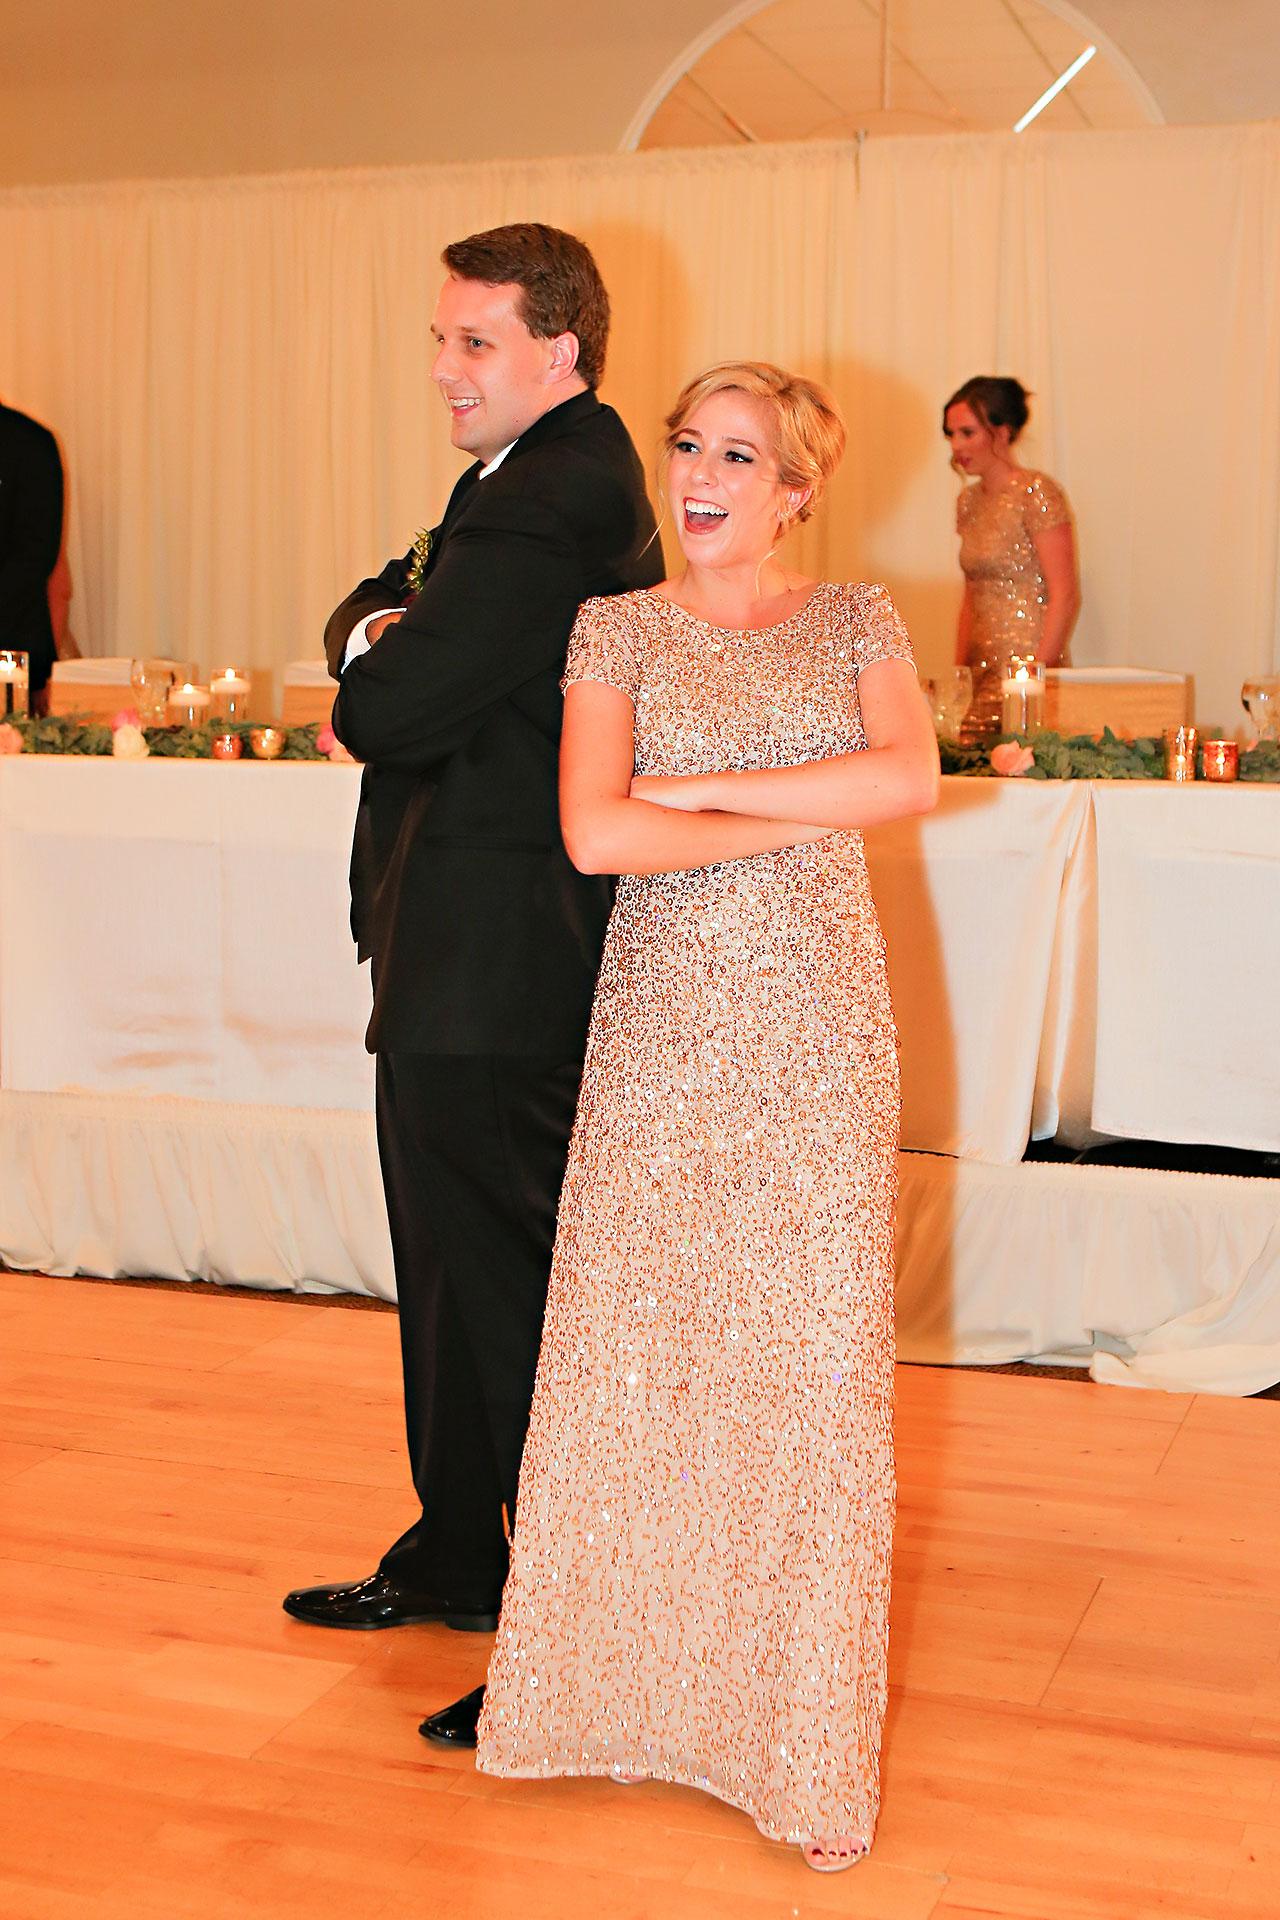 Emily JD Carmel Indiana Wedding 301